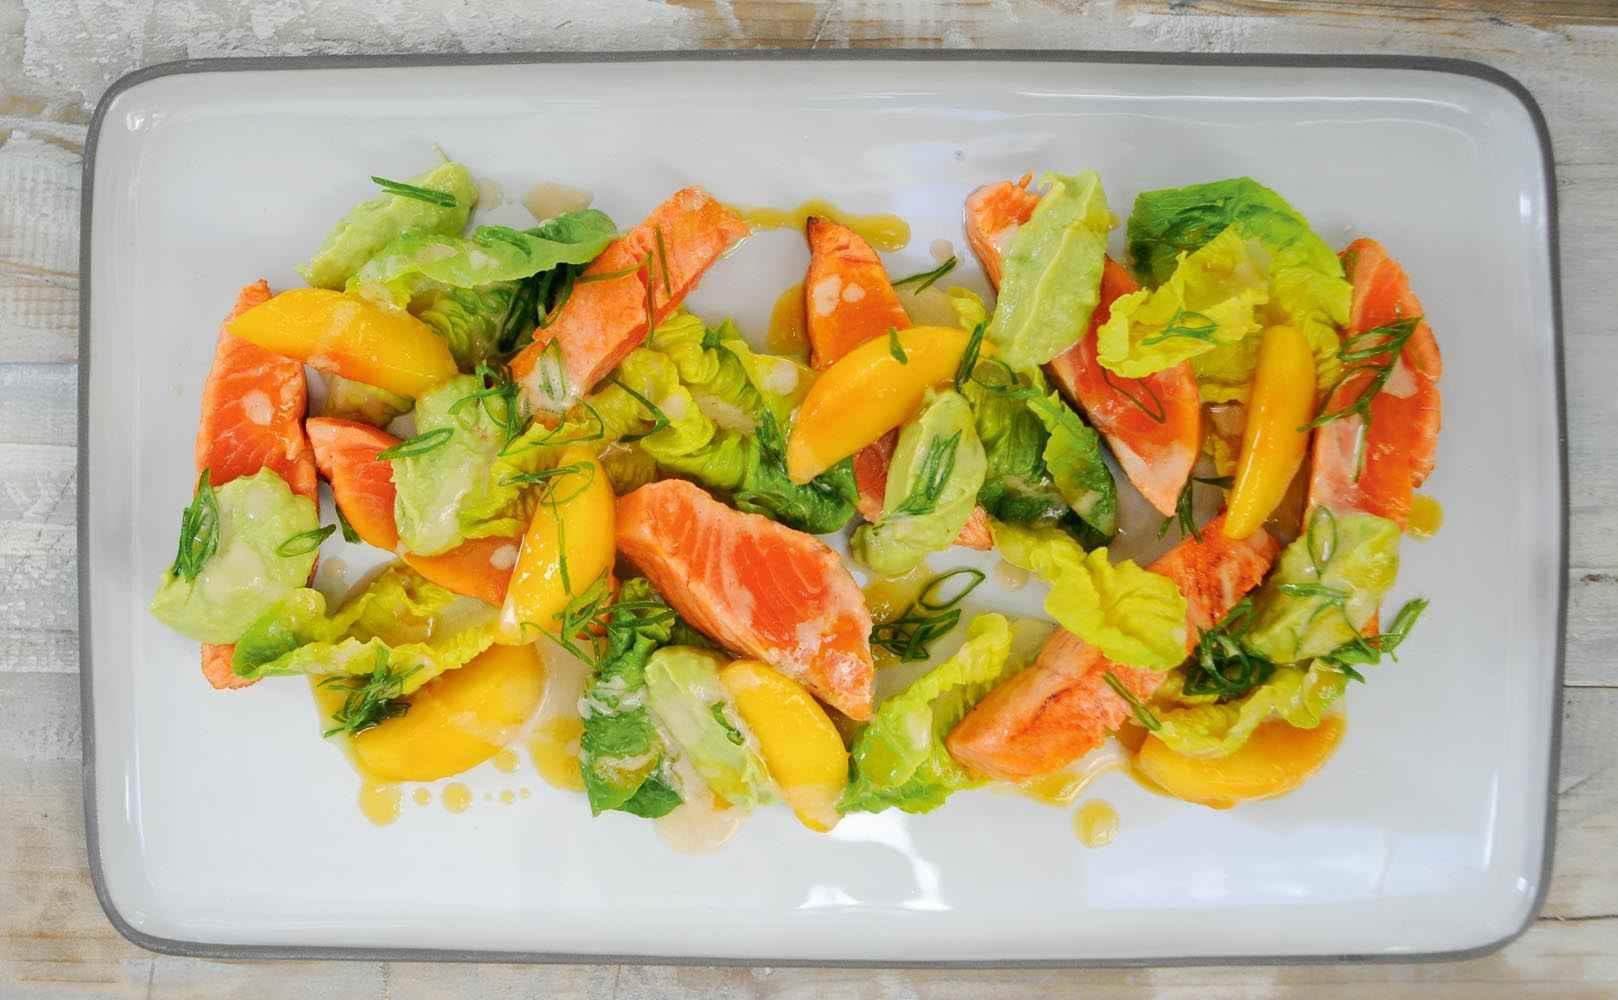 Rezept für lauwarme Fjordforelle – Guacamole – Pfirsich – Romana-Salat